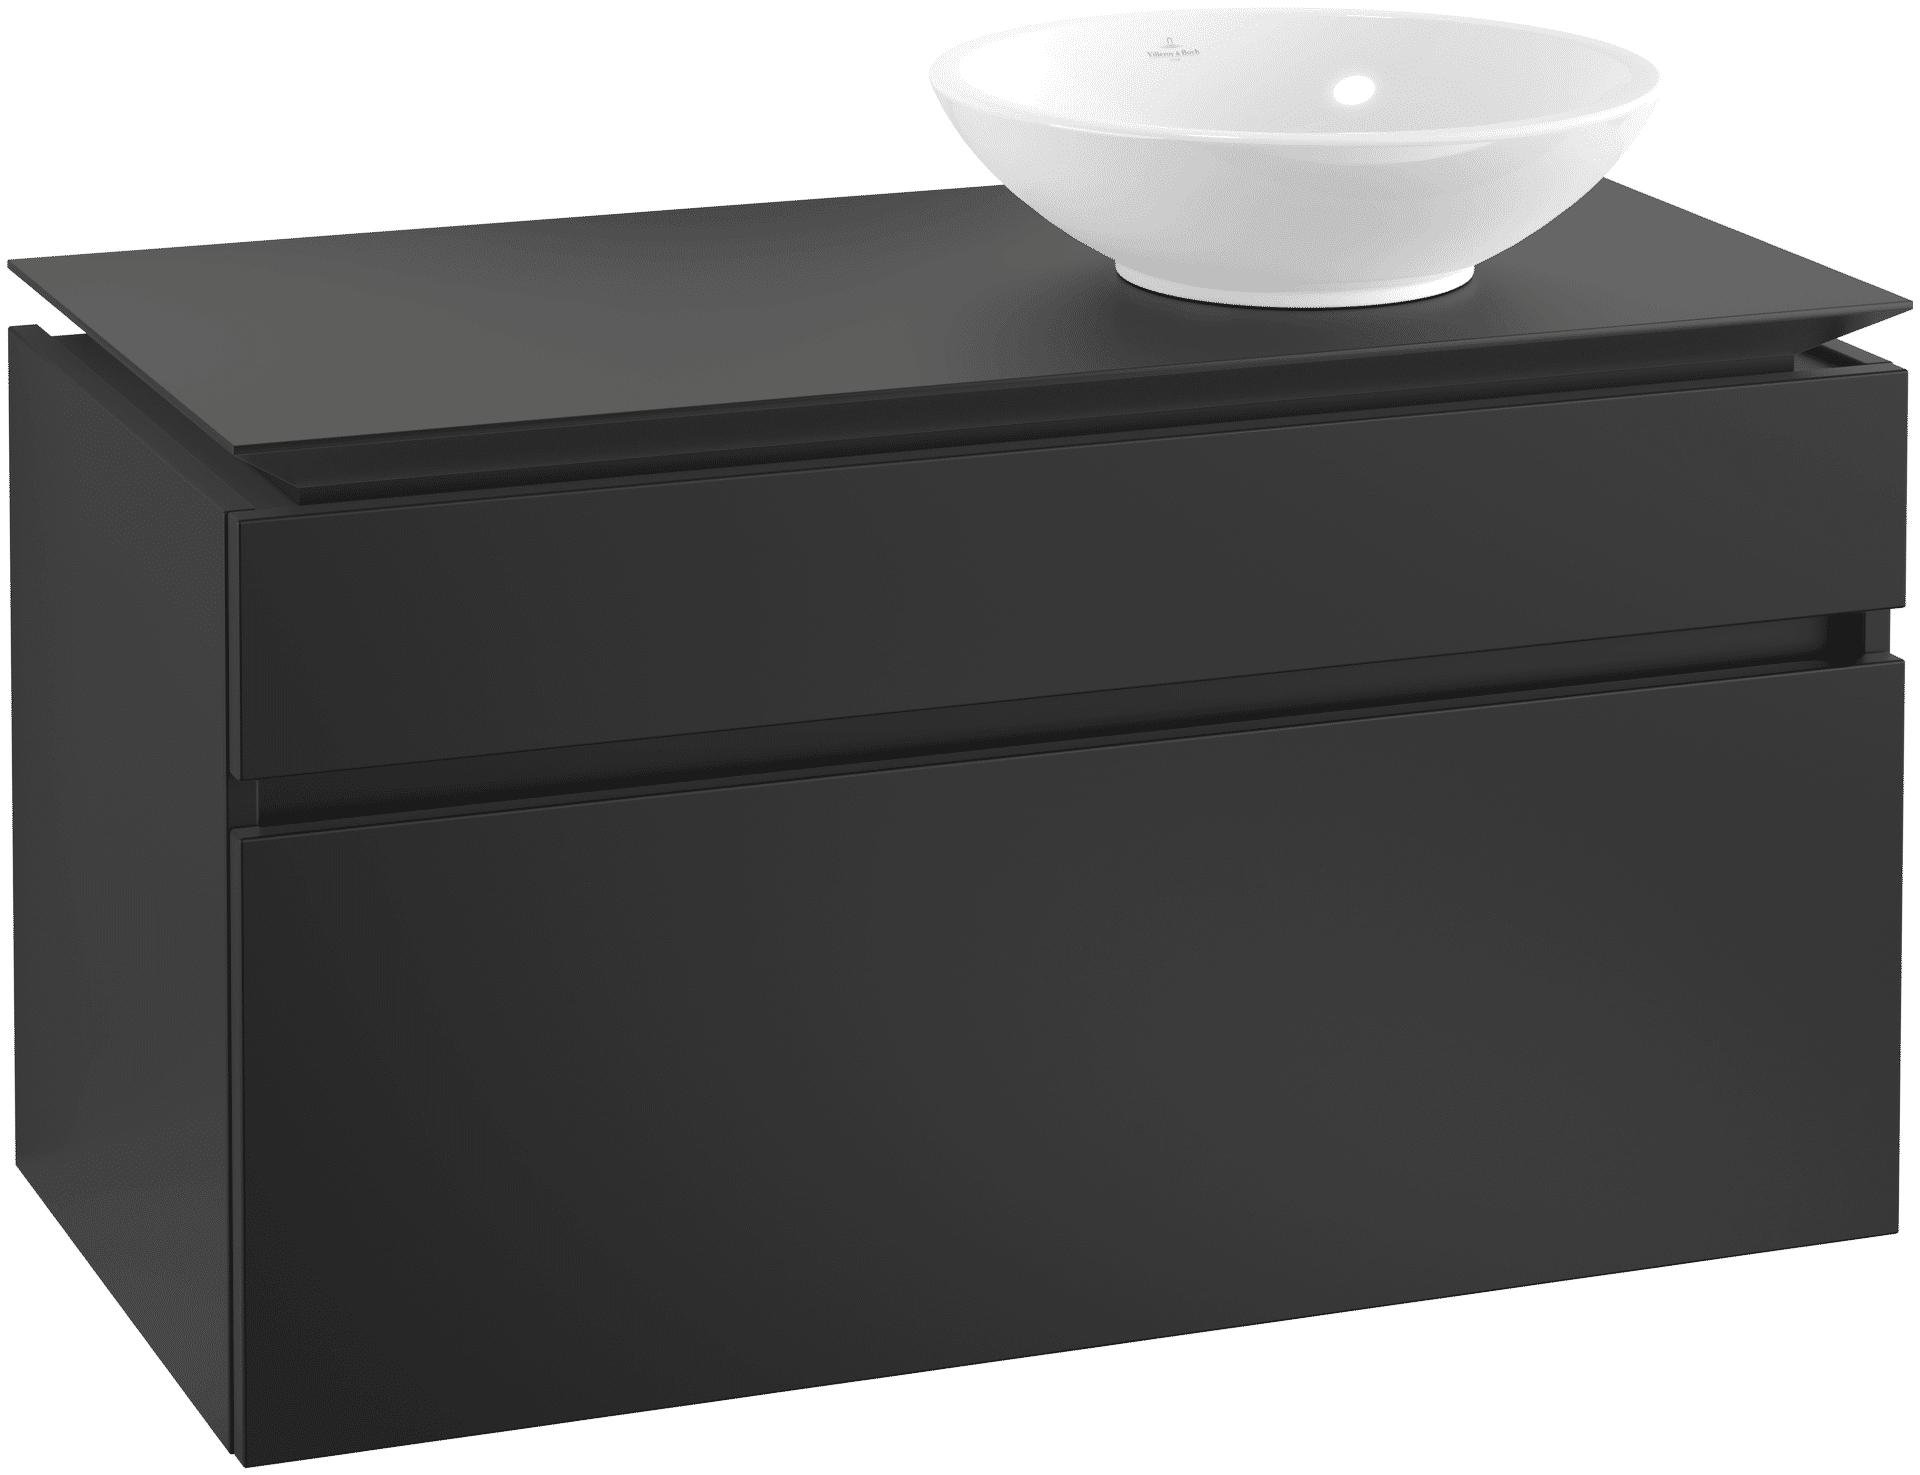 Villeroy & Boch Villeroy & Boch Legato - Meuble sous lavabo with 2 drawers & 1 cut-out right 1000 x 550 x 500mm noir mat